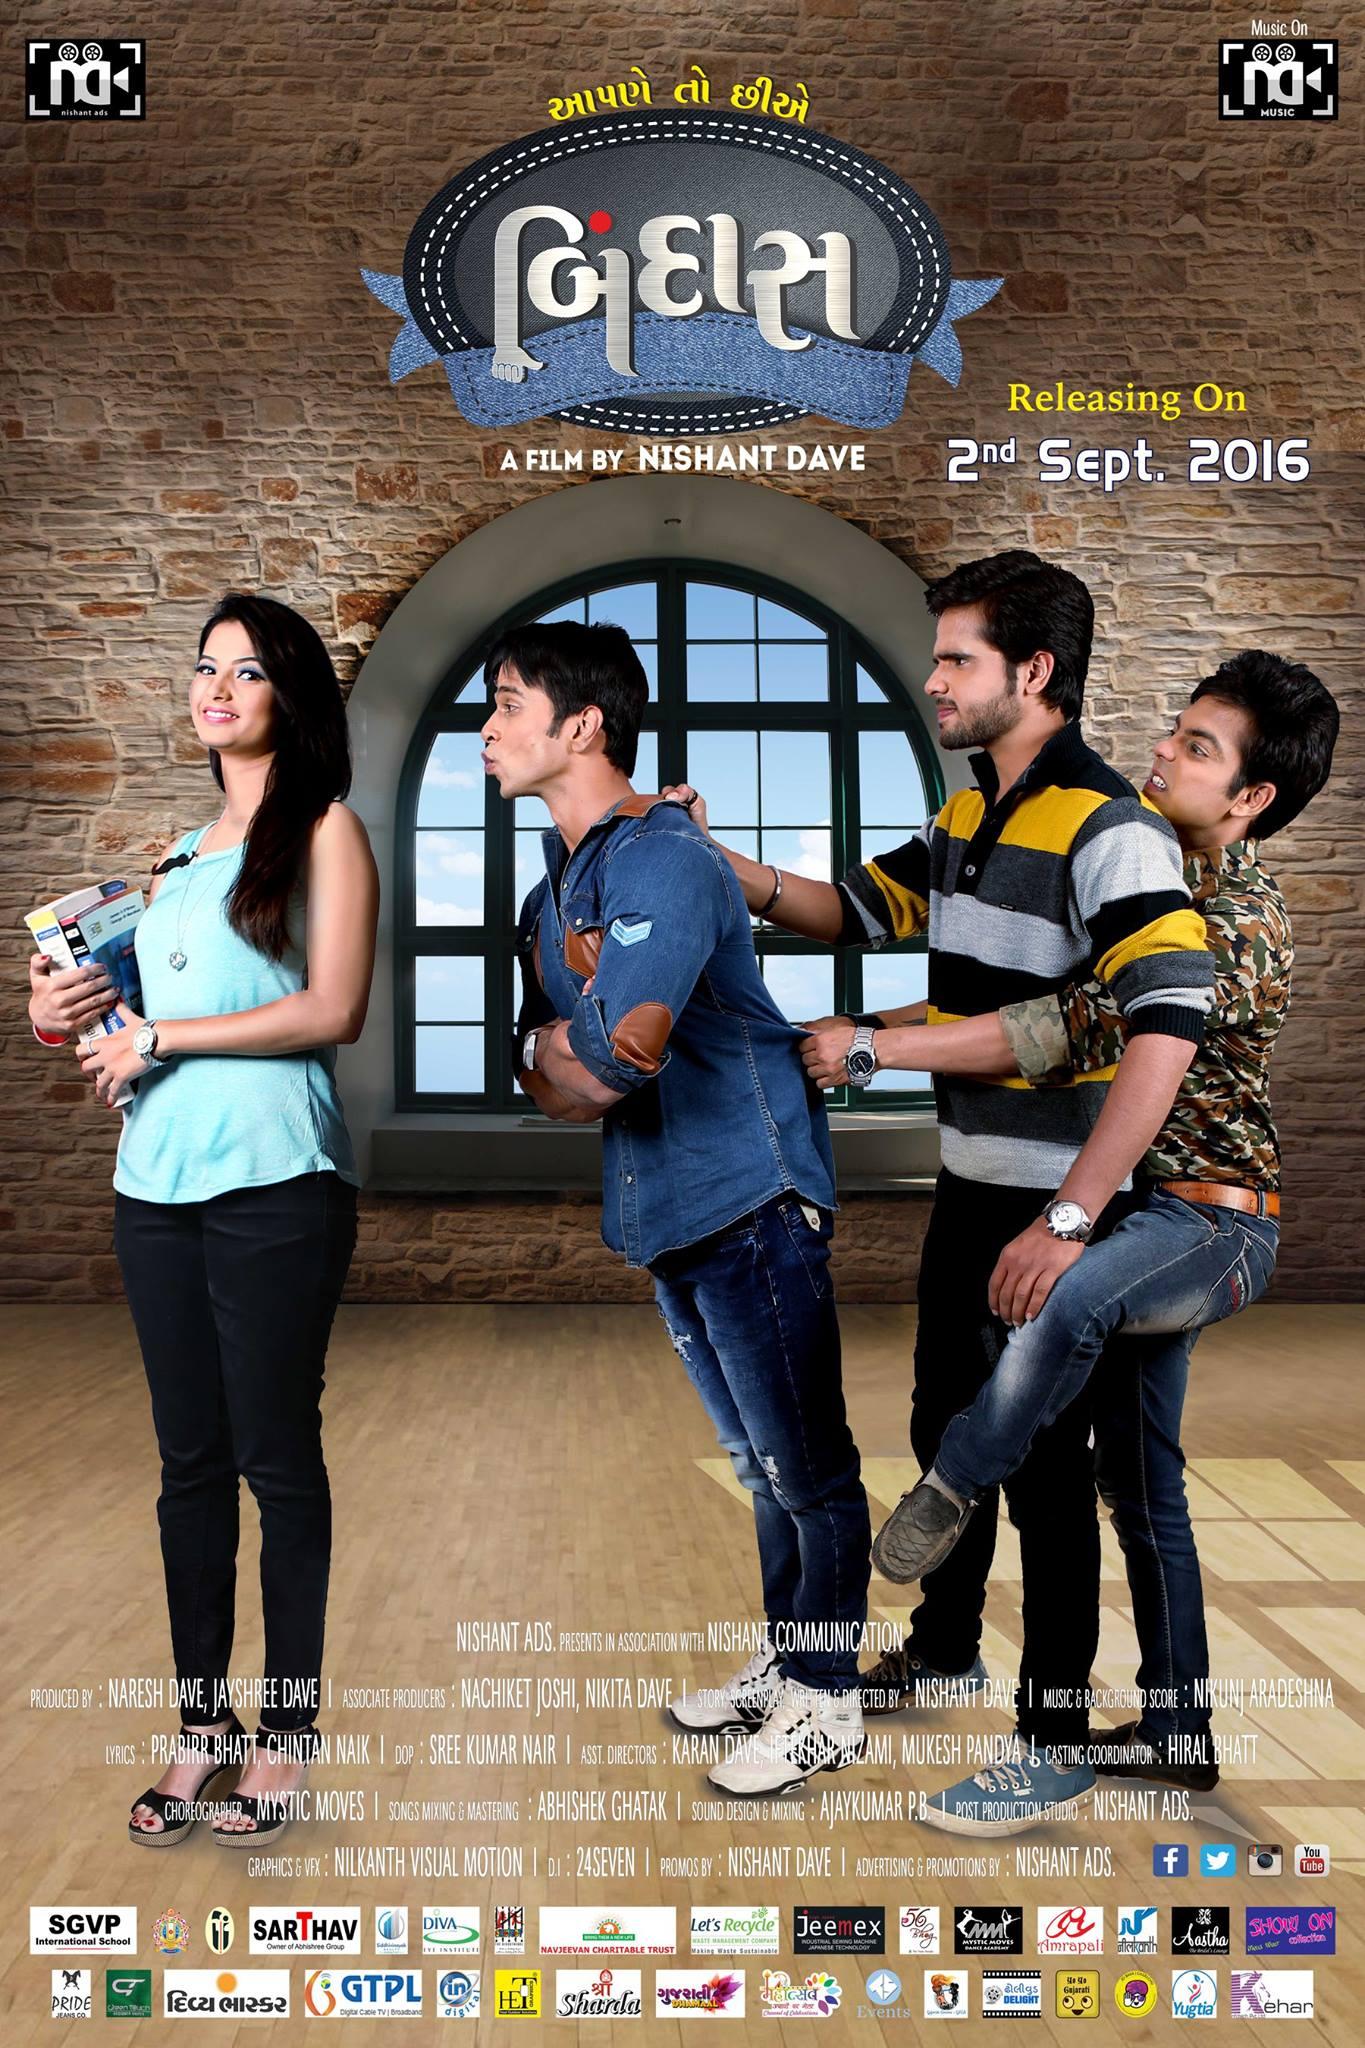 Download Aapne Toh Chhie Bindaas 2016 Gujarati 720p HDRip ESubs 1.2GB